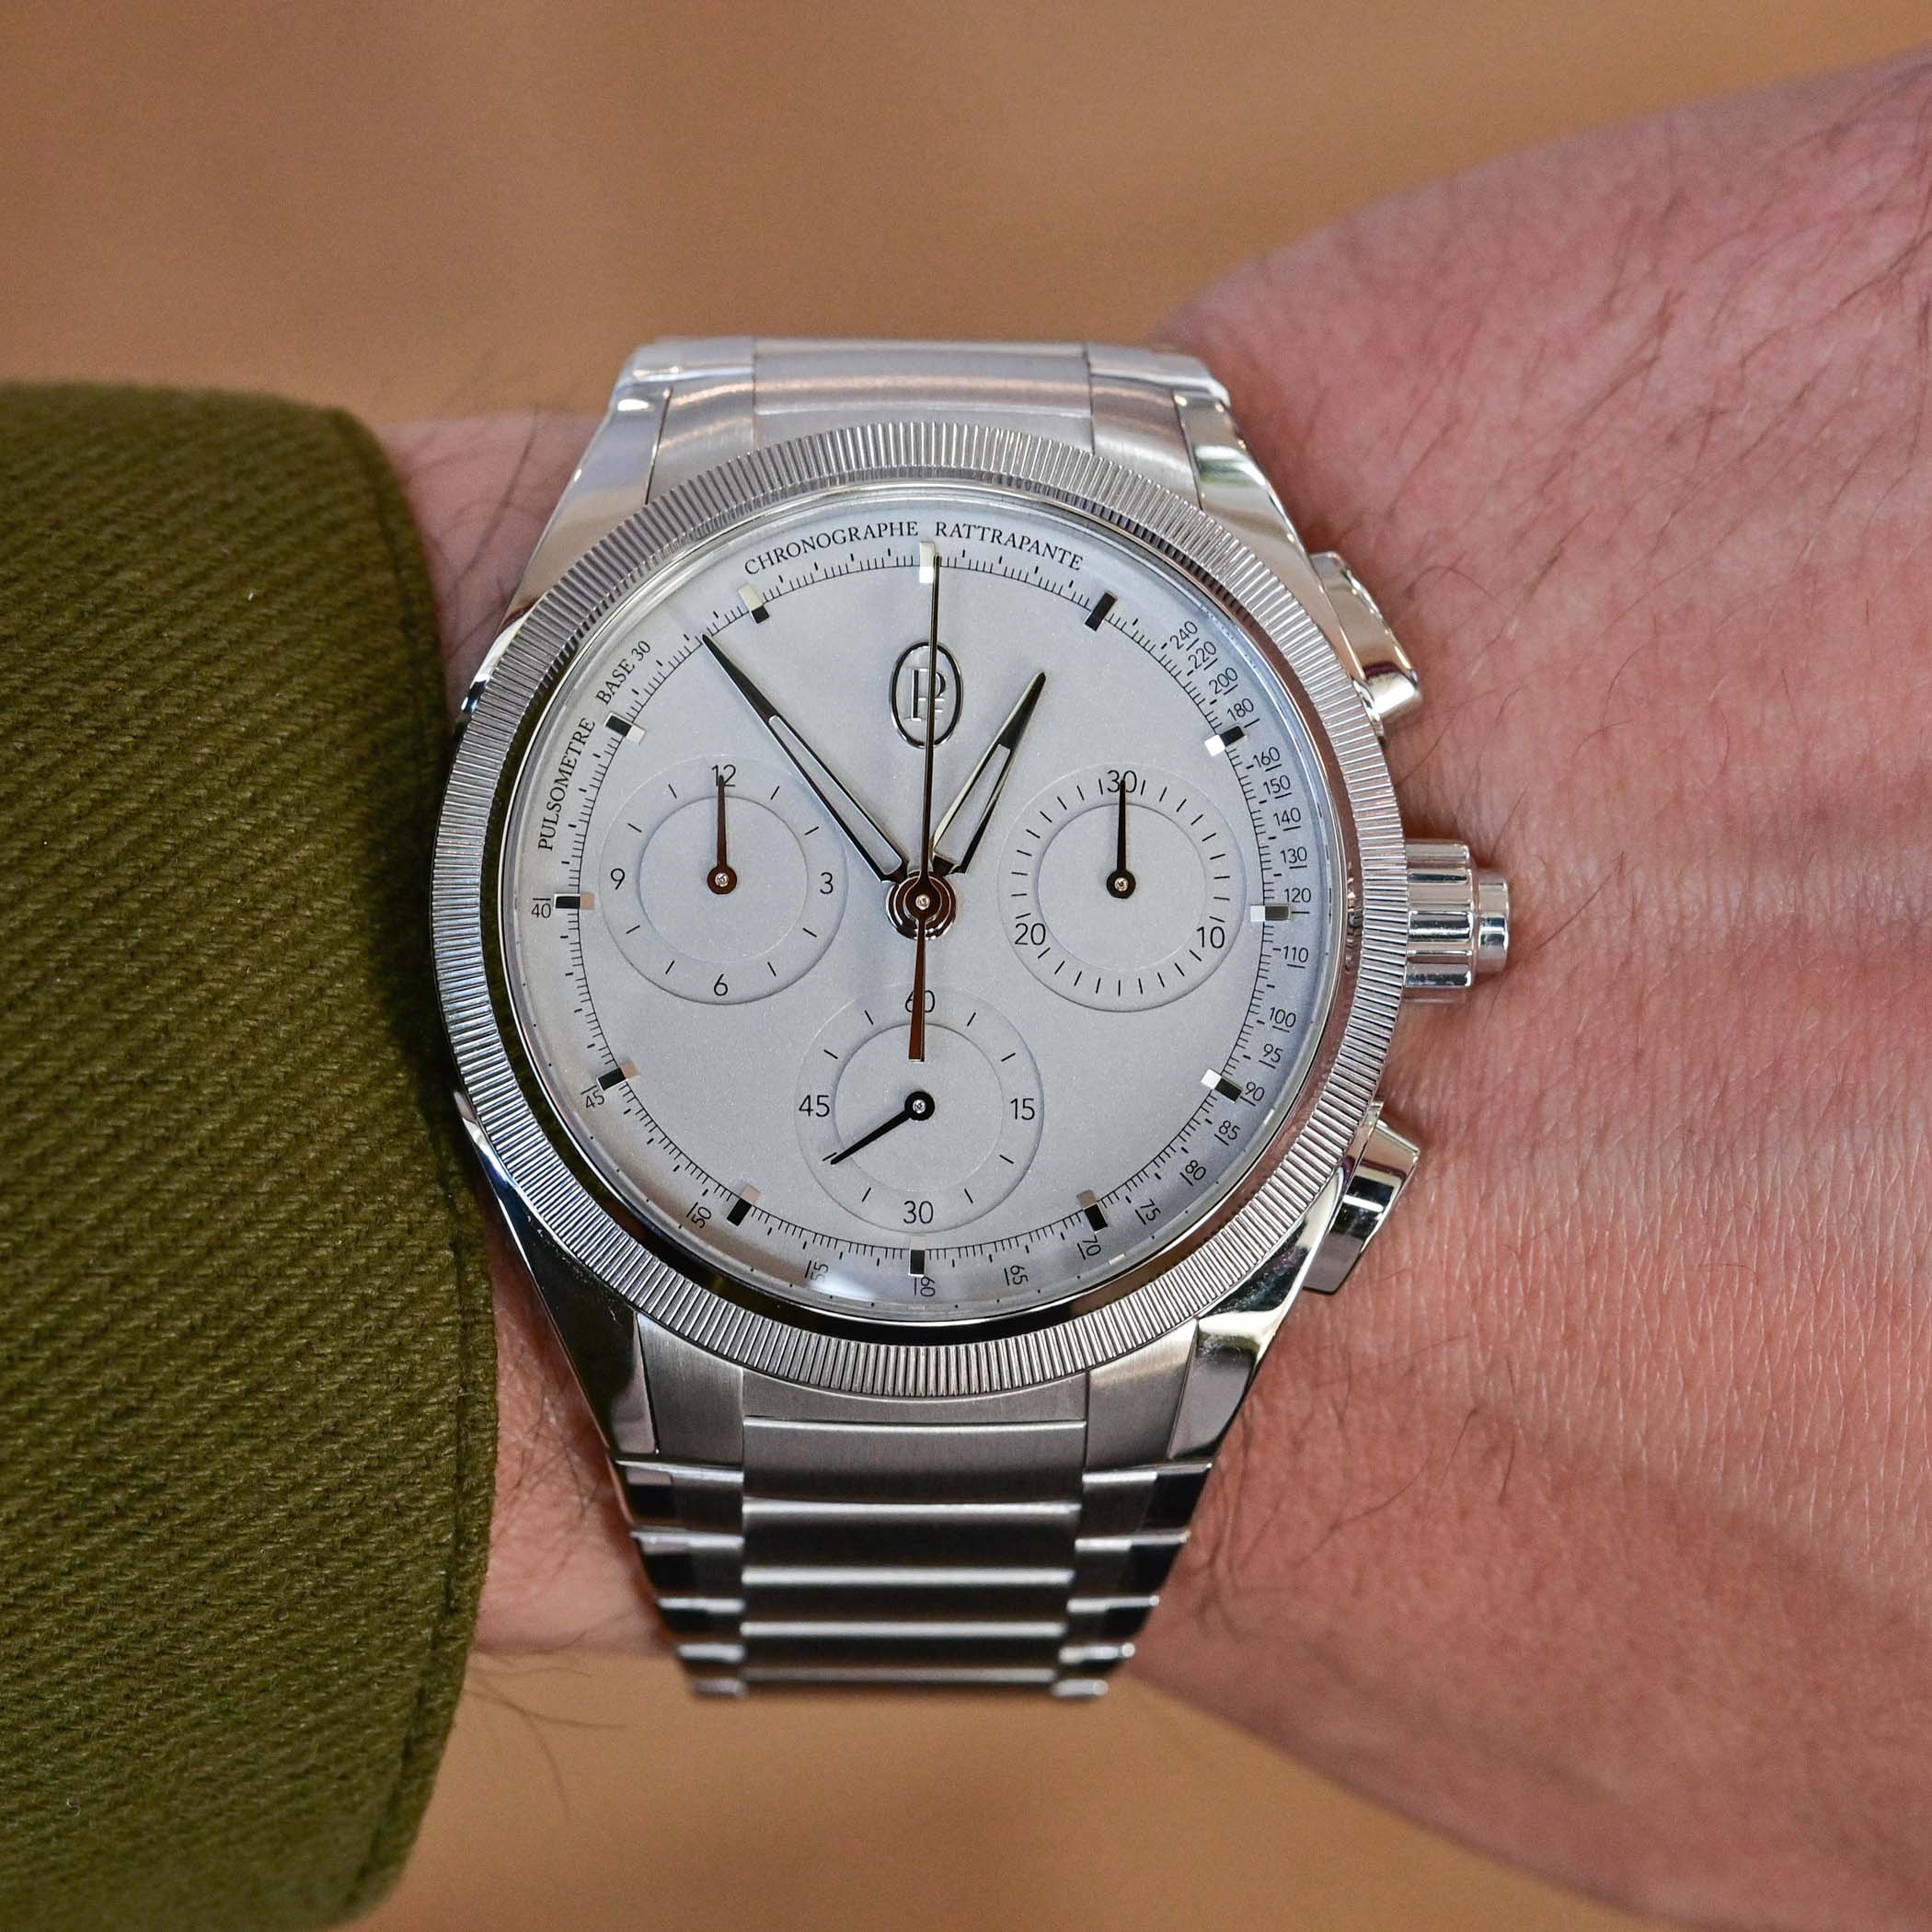 Parmigiani Fleurier Tonda PF Split Seconds Chronograph Platinum Chrono Movement PFH916-2010001-200182 - review - 2